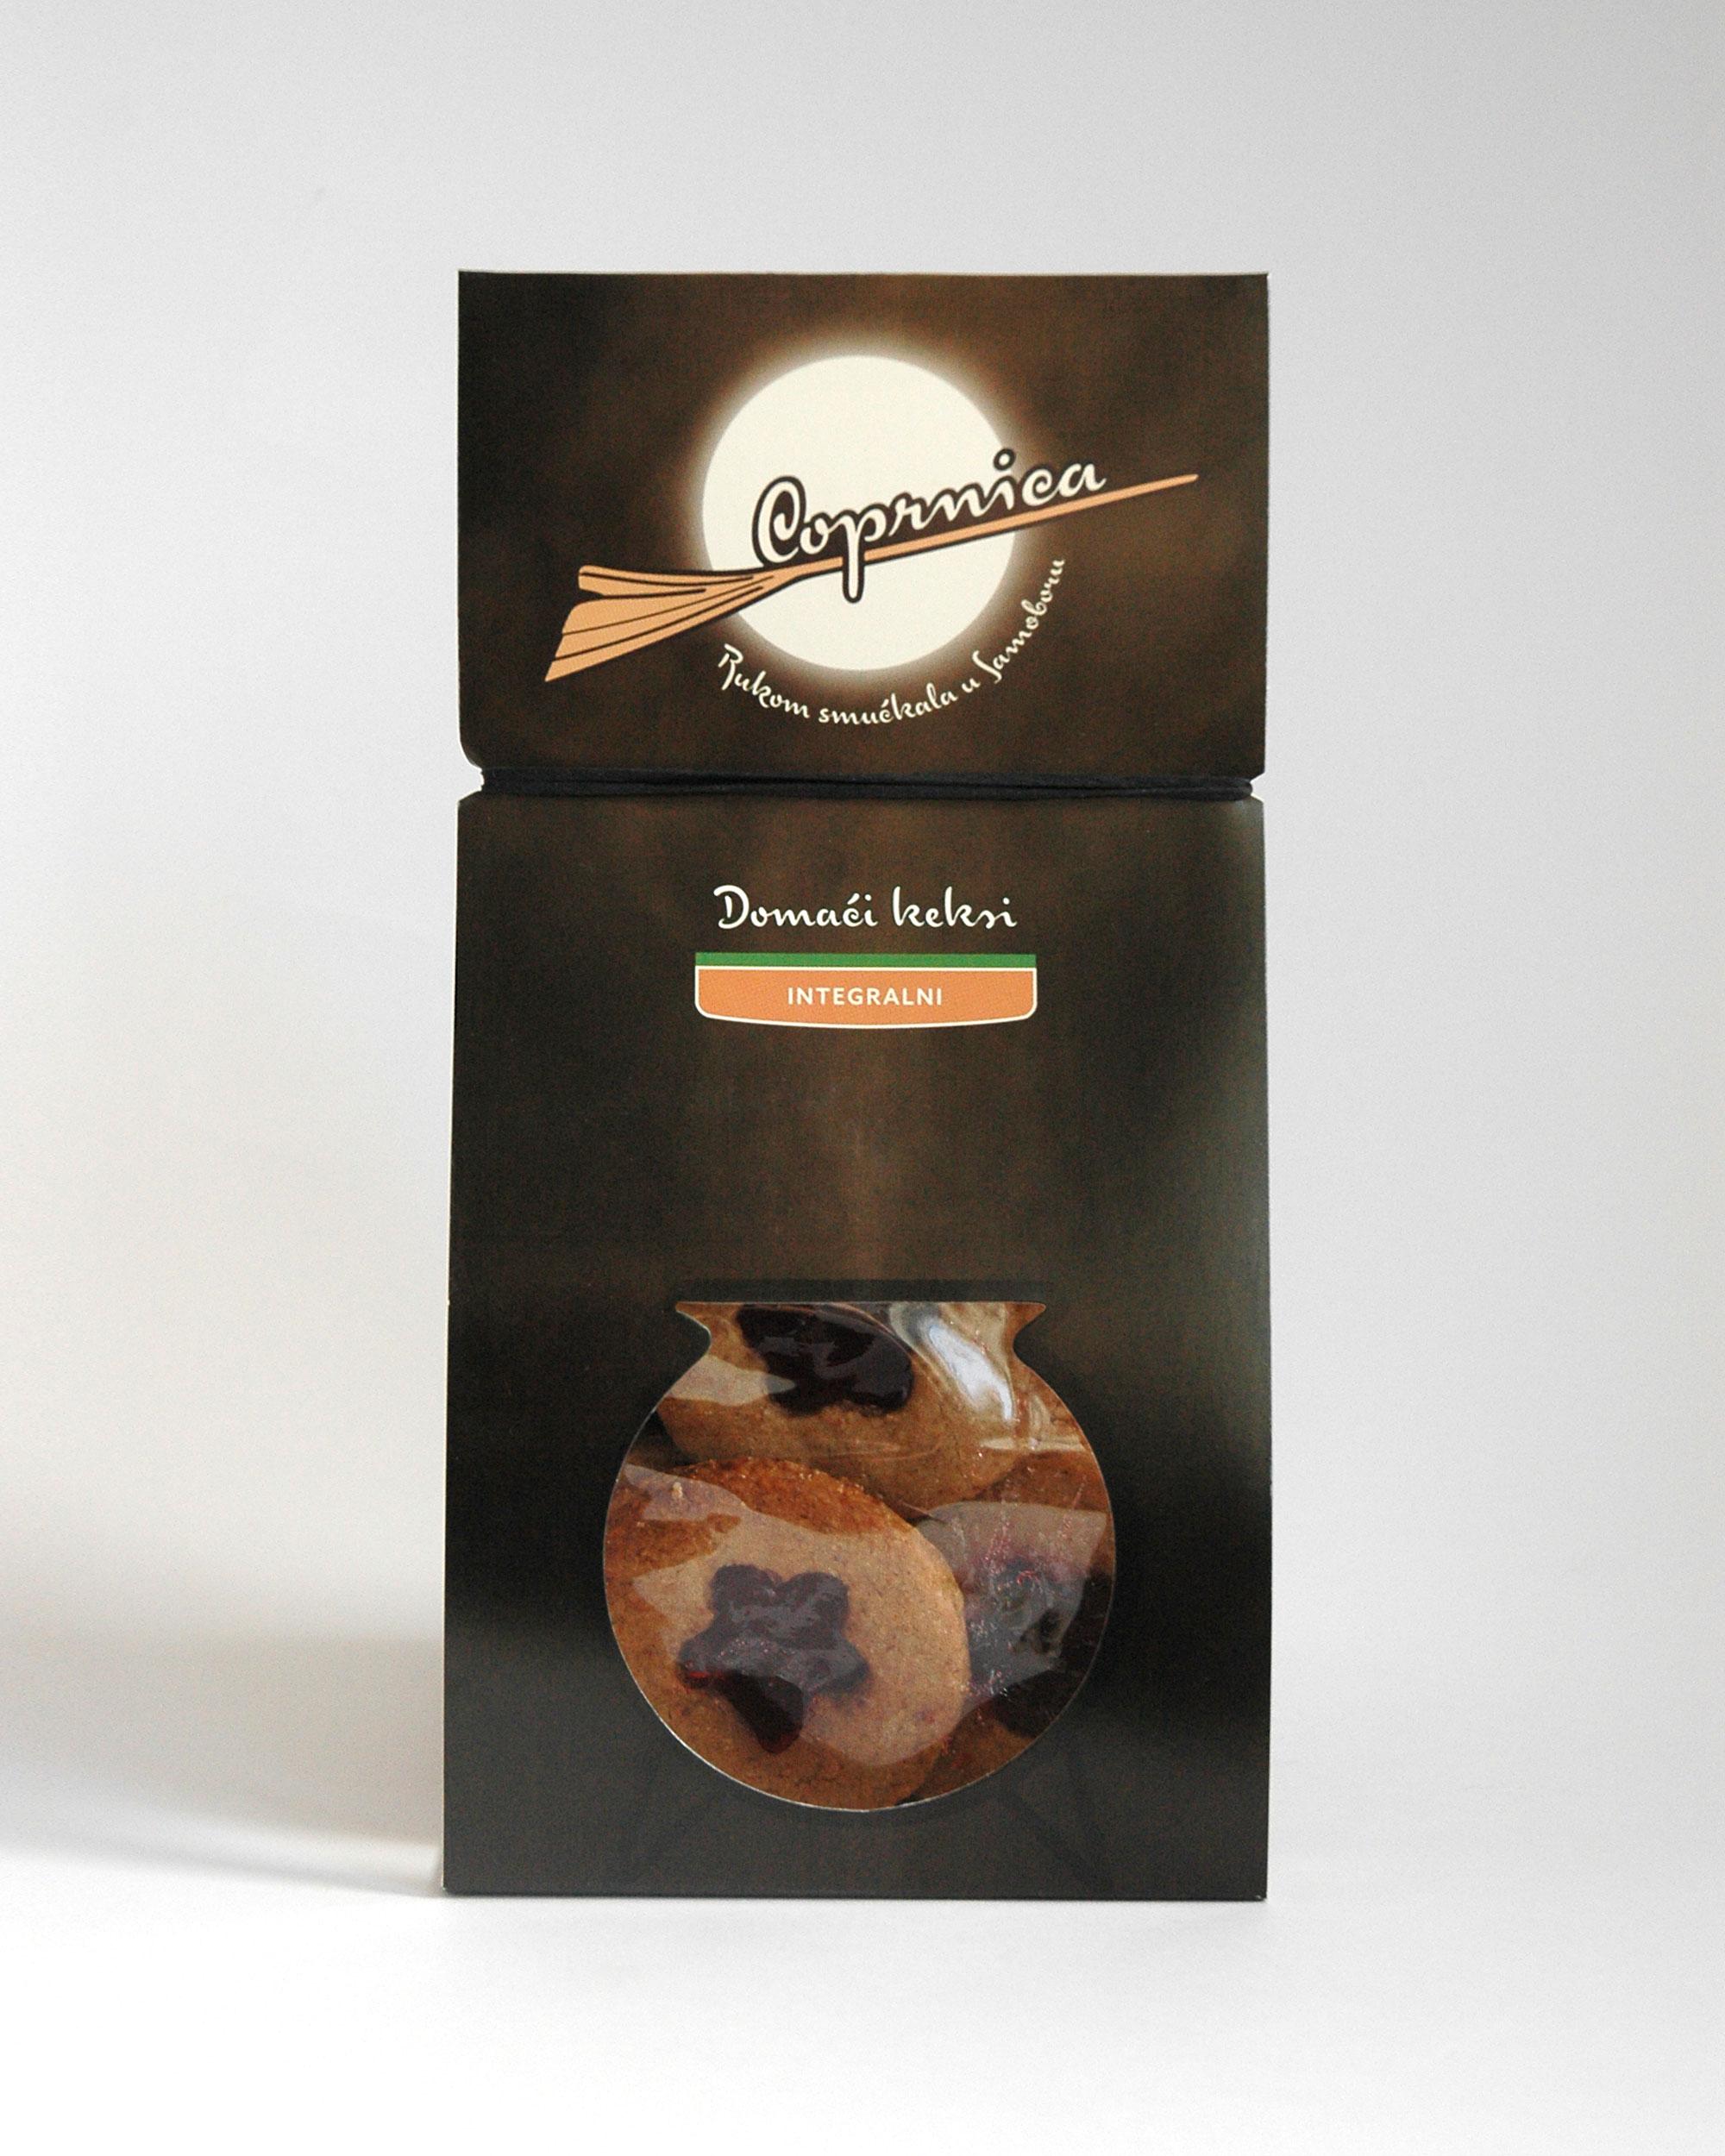 masavukmanovic.com - coprnica packaging 02